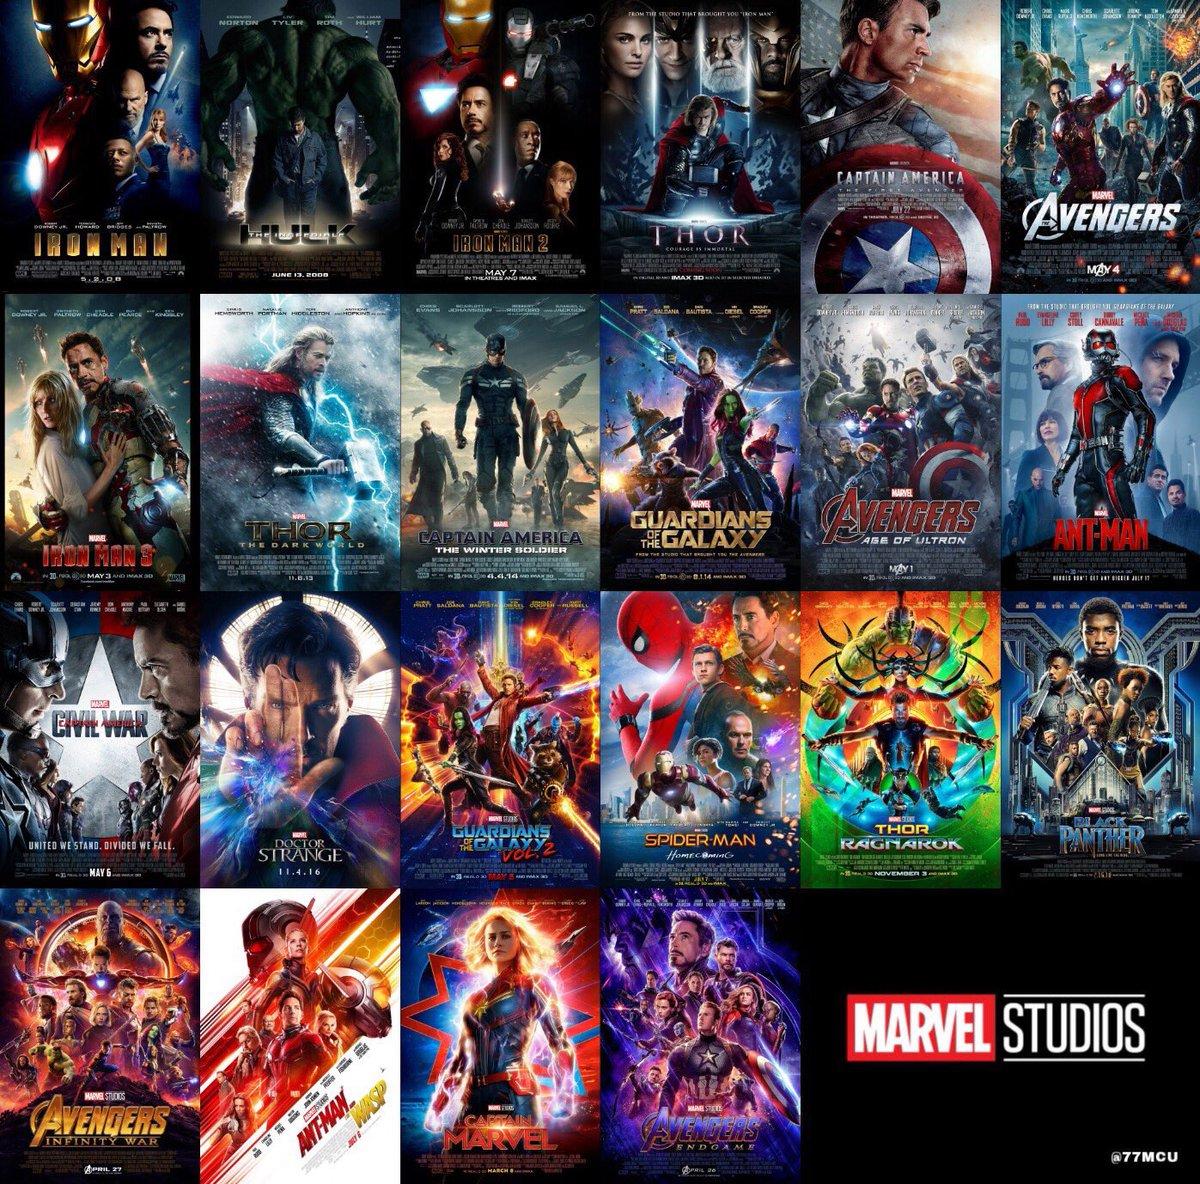 Marvel Universe on Twitter: